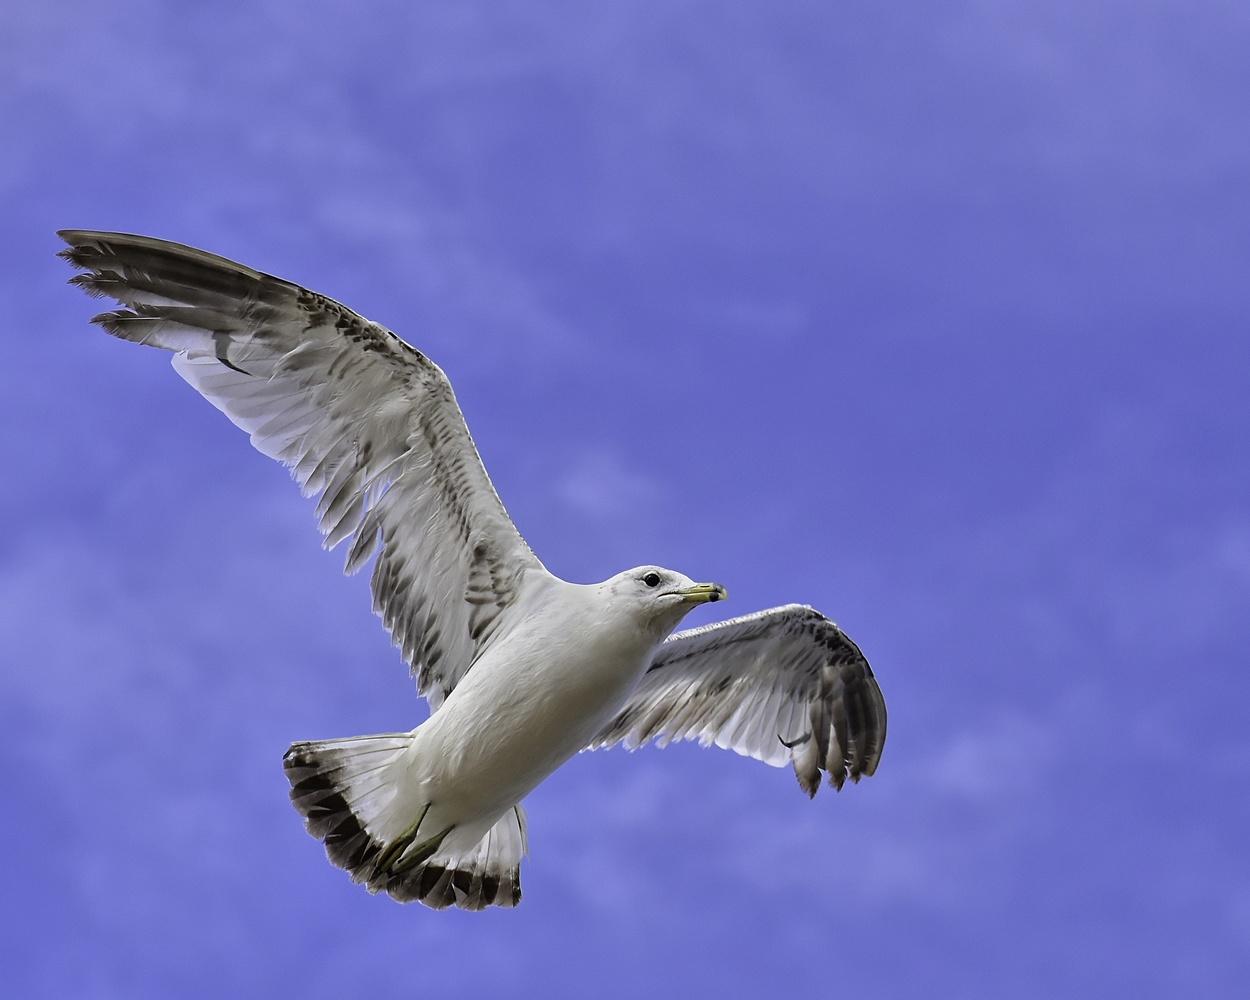 Gull by Matthew Lacy